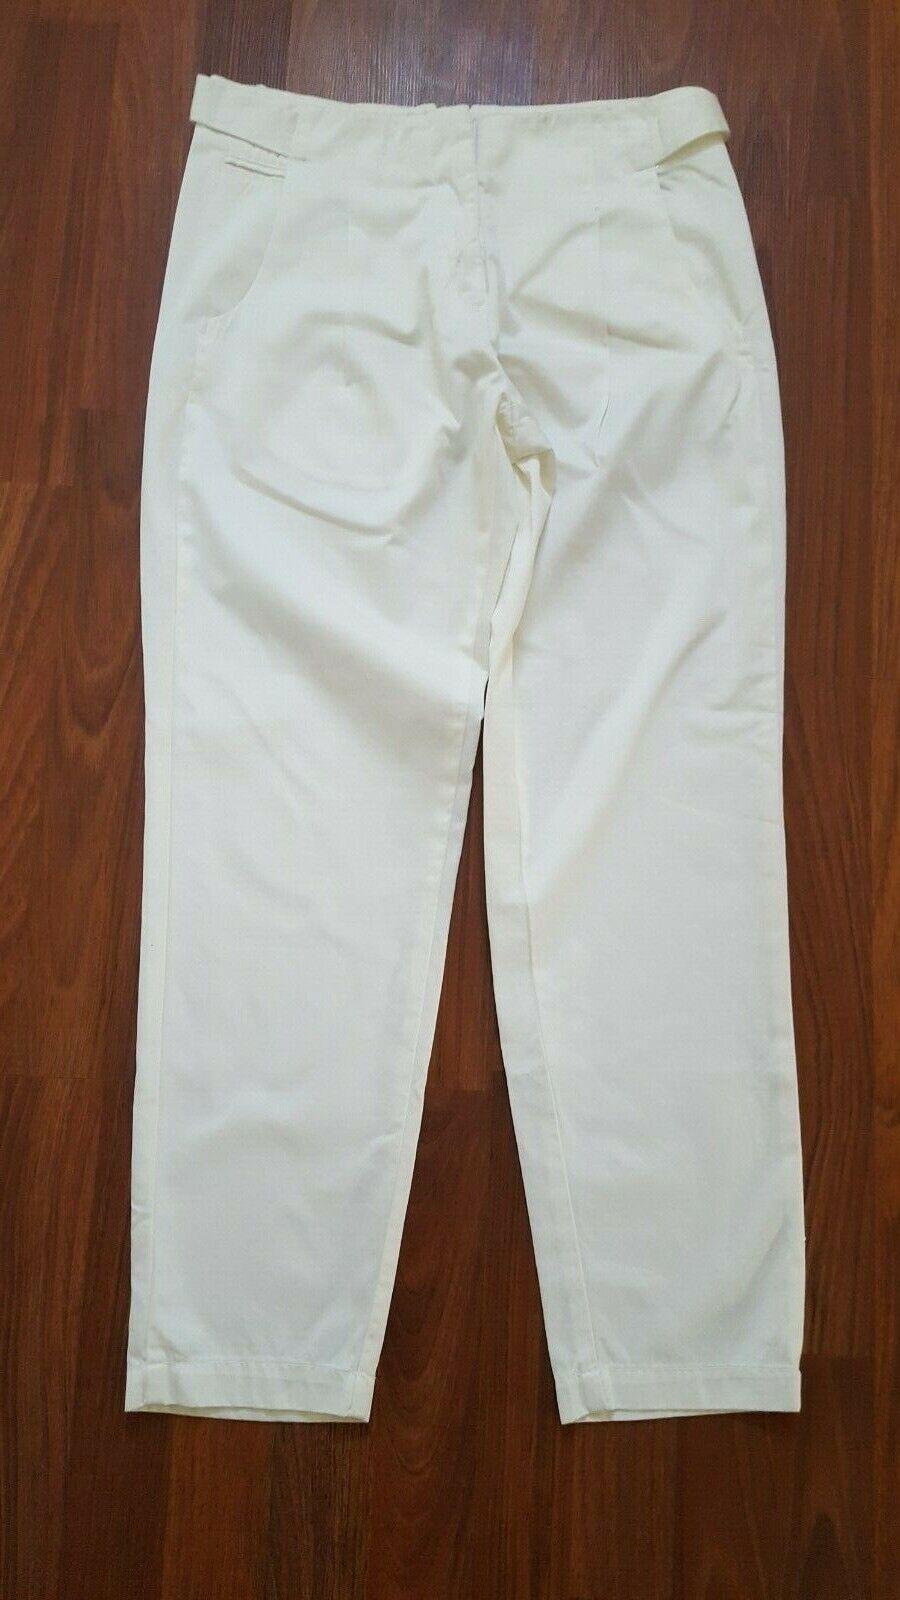 160 KORAL Anthropologie Women Ankle Trousers Pants Ivory Medium M New